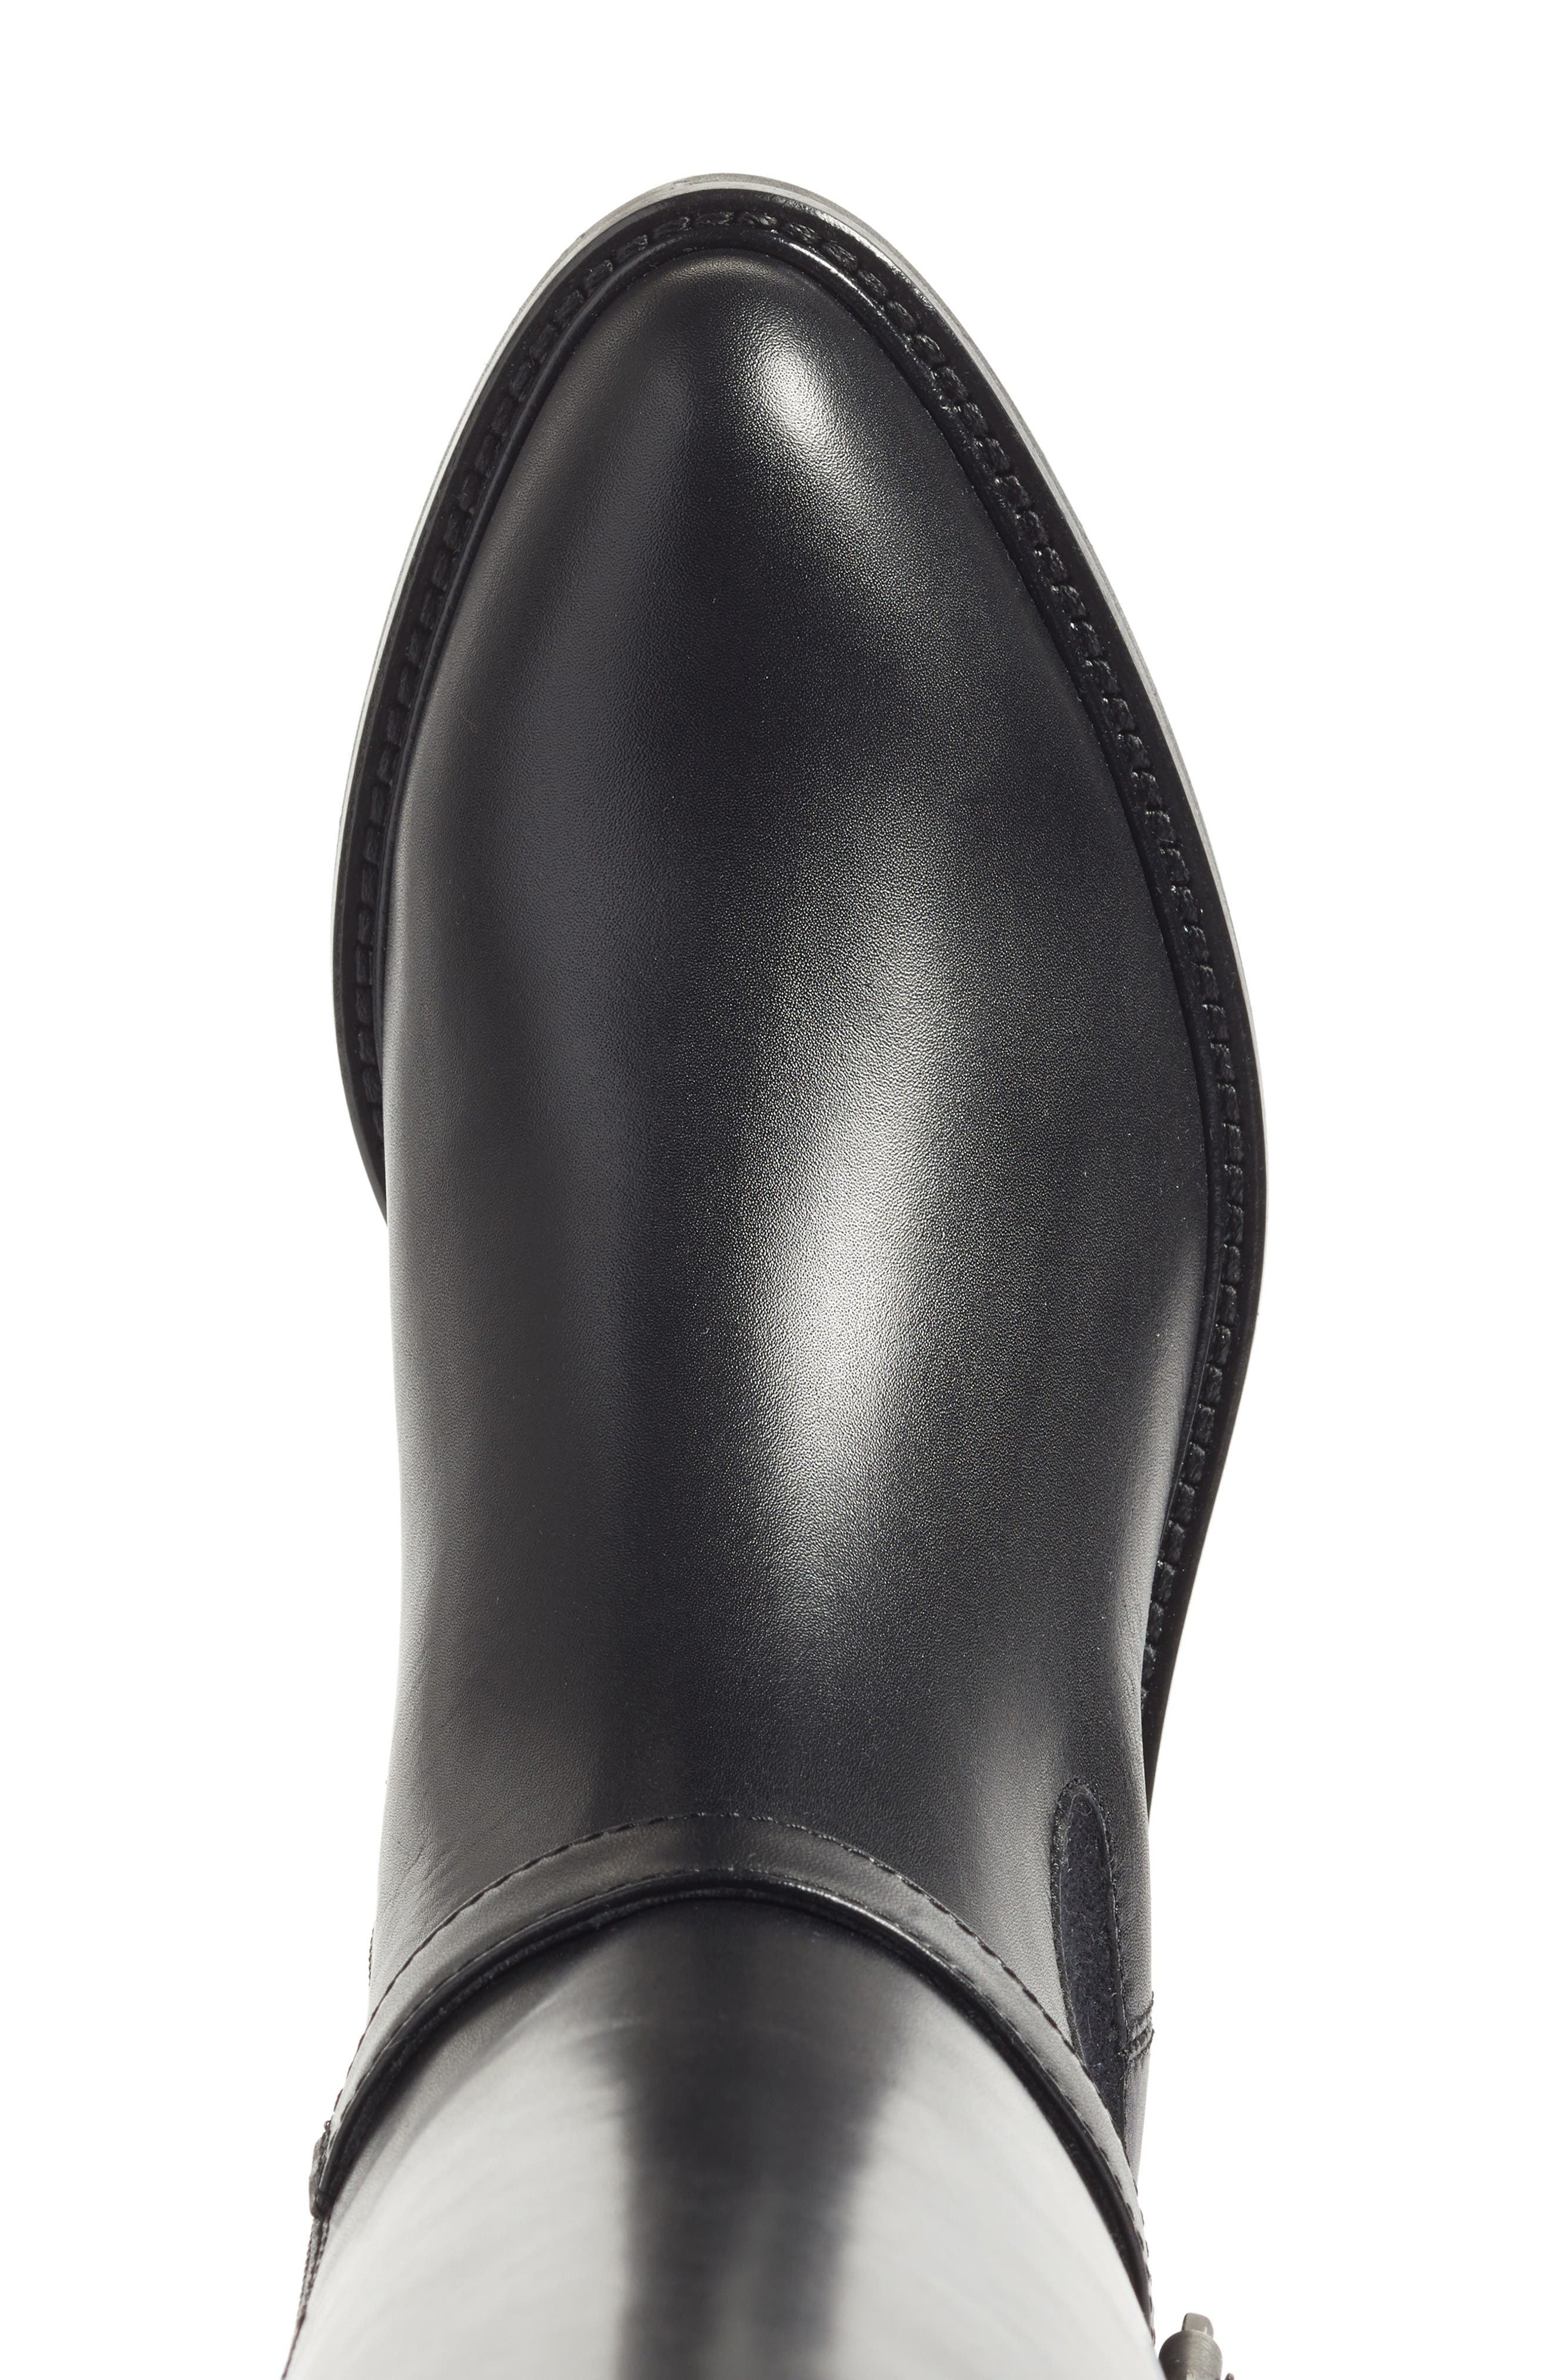 Genna Weatherproof Tall Boot,                             Alternate thumbnail 6, color,                             Black Calf/ Elastic/ Suede